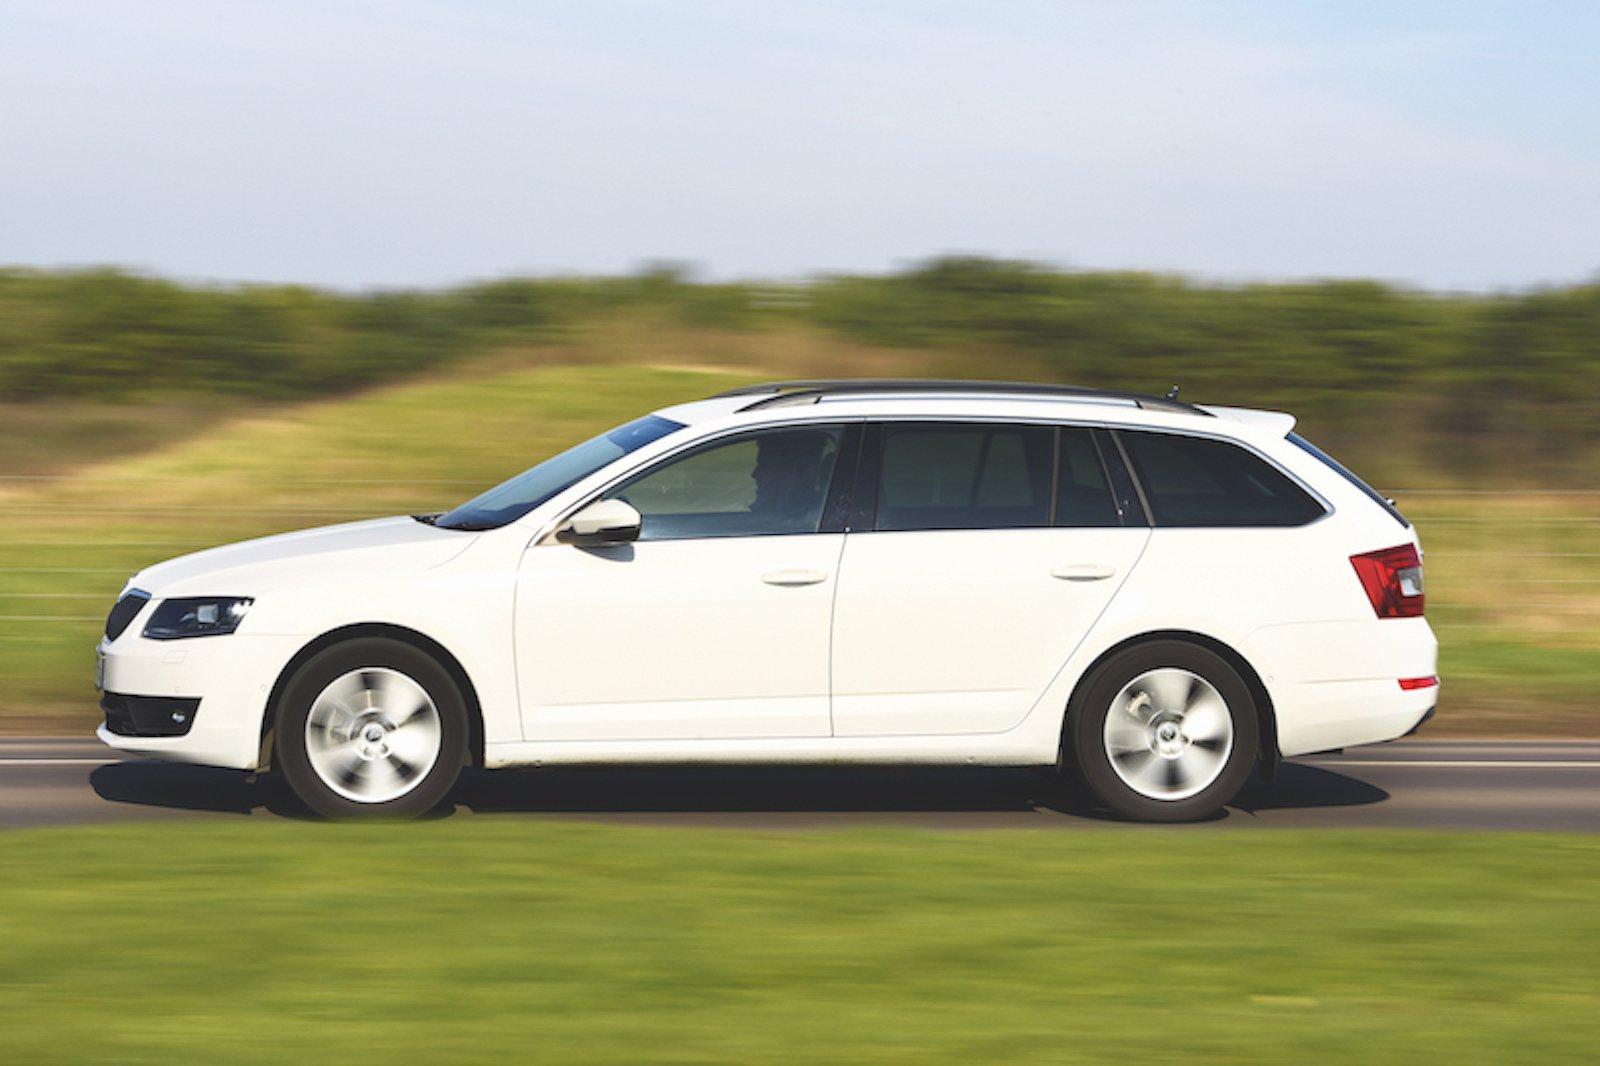 Used test: Skoda Octavia Estate vs Vauxhall Astra Sports Tourer